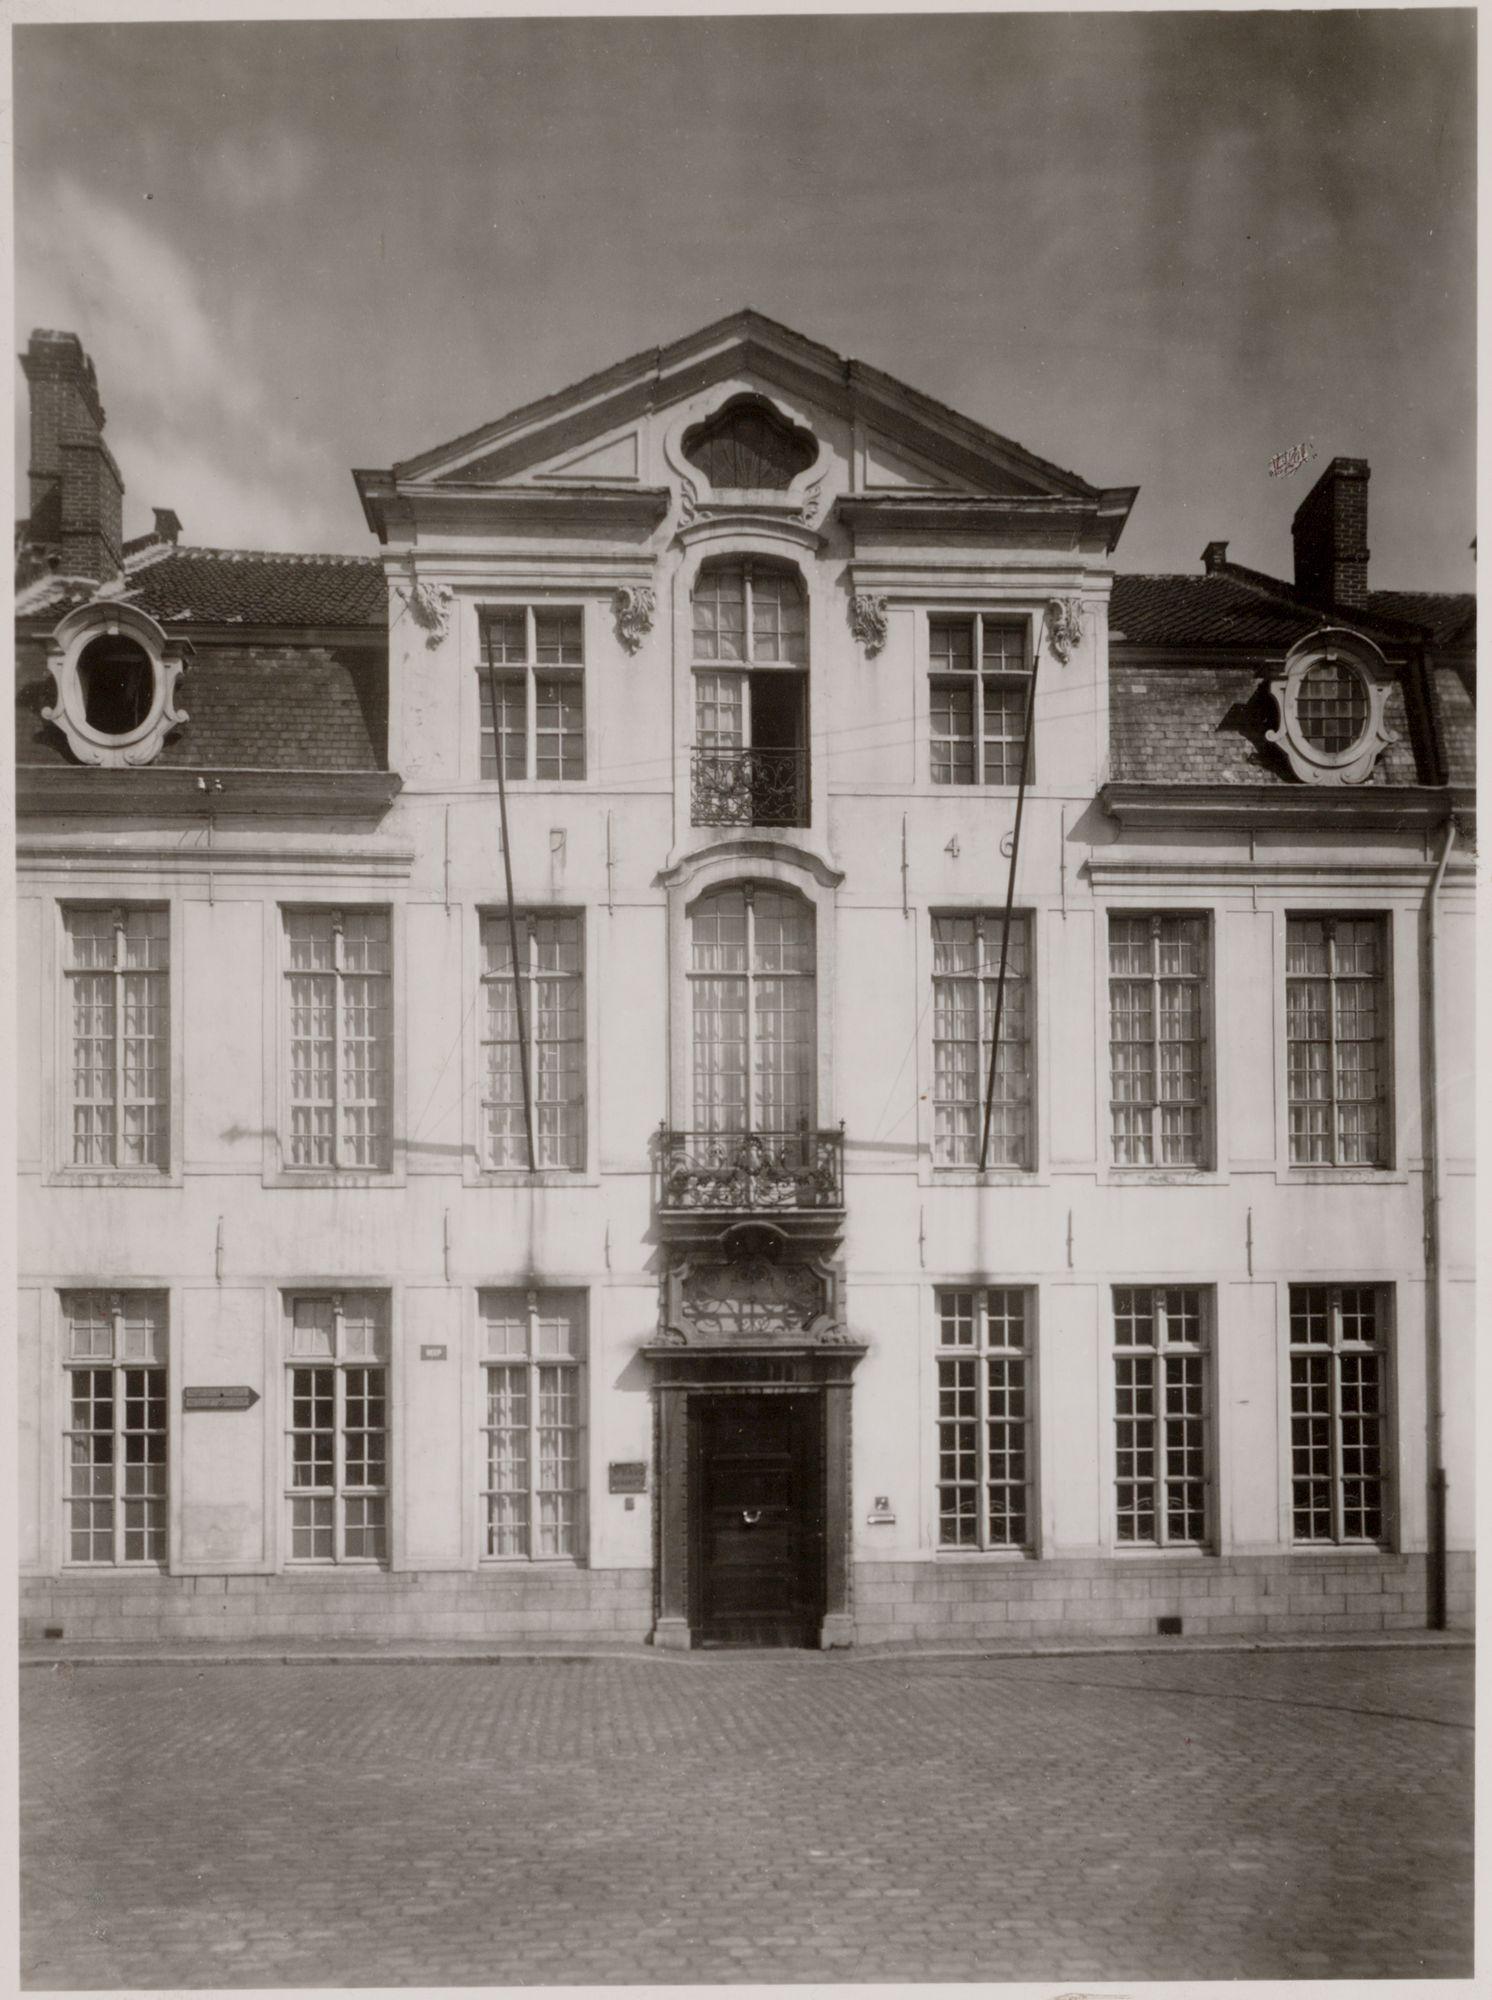 Gent: Hotel van Eersel, Reep